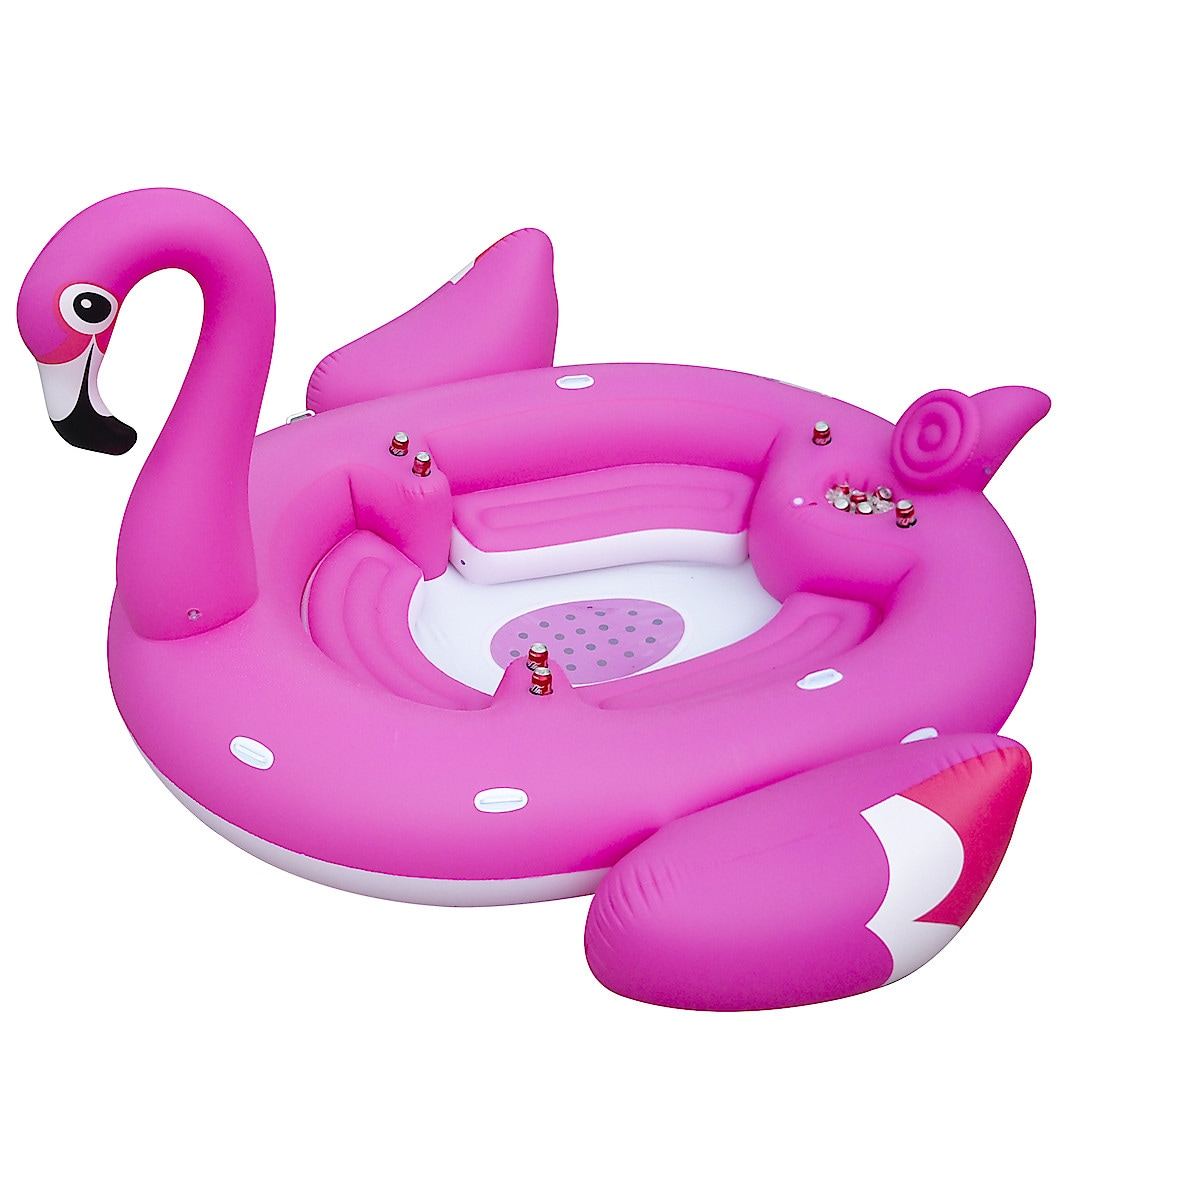 Puhallettava lautta Mega Flamingo